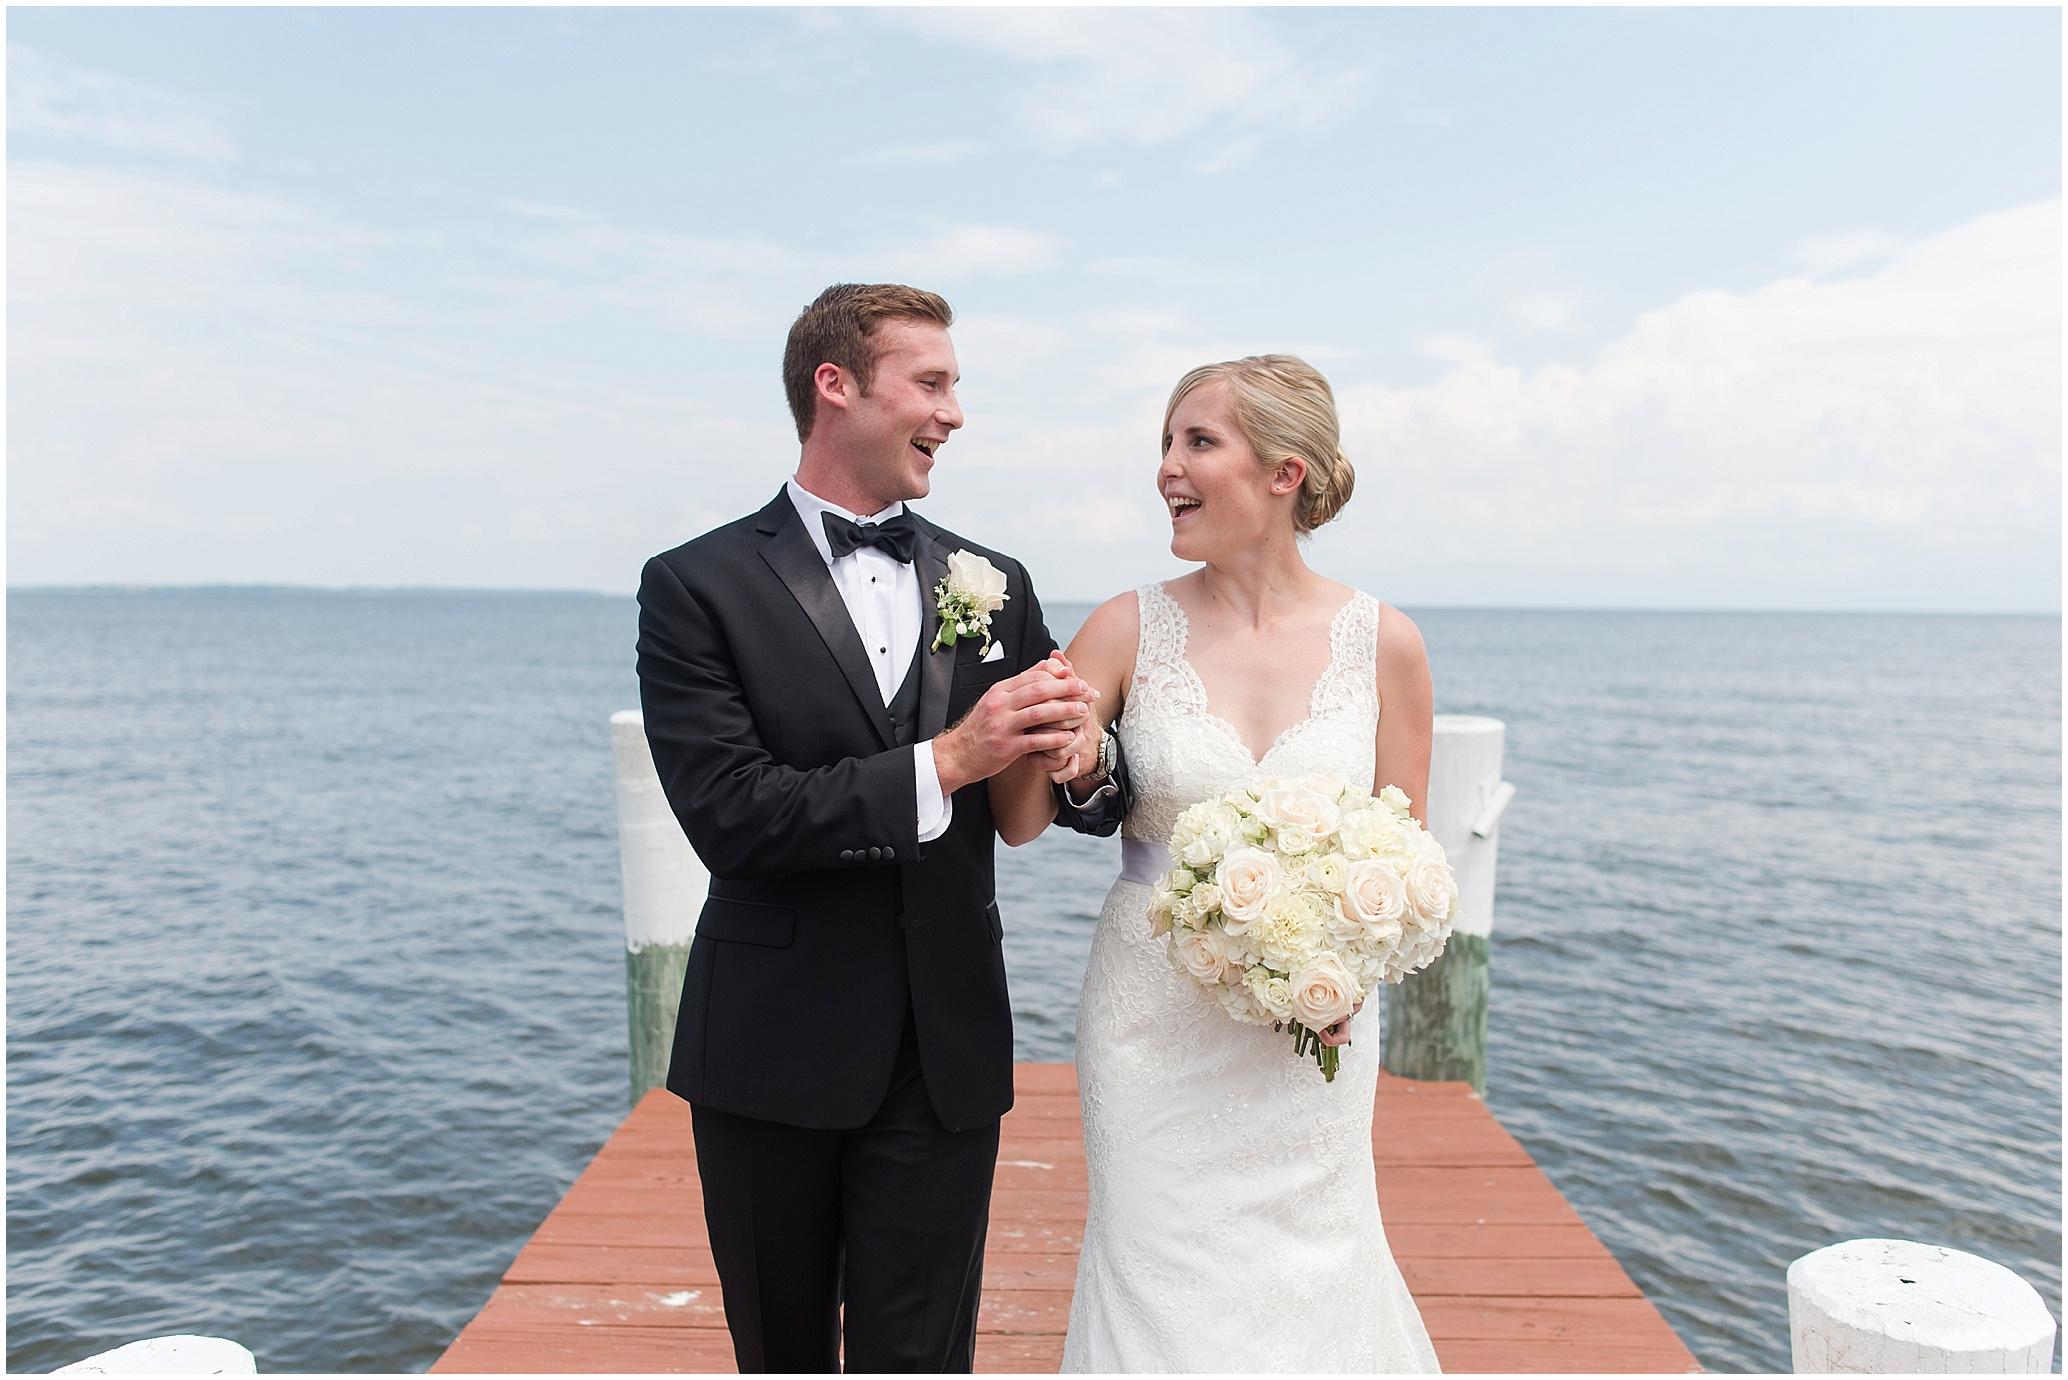 Hannah Leigh Photography Celebrations at the Bay Wedding_1002.jpg